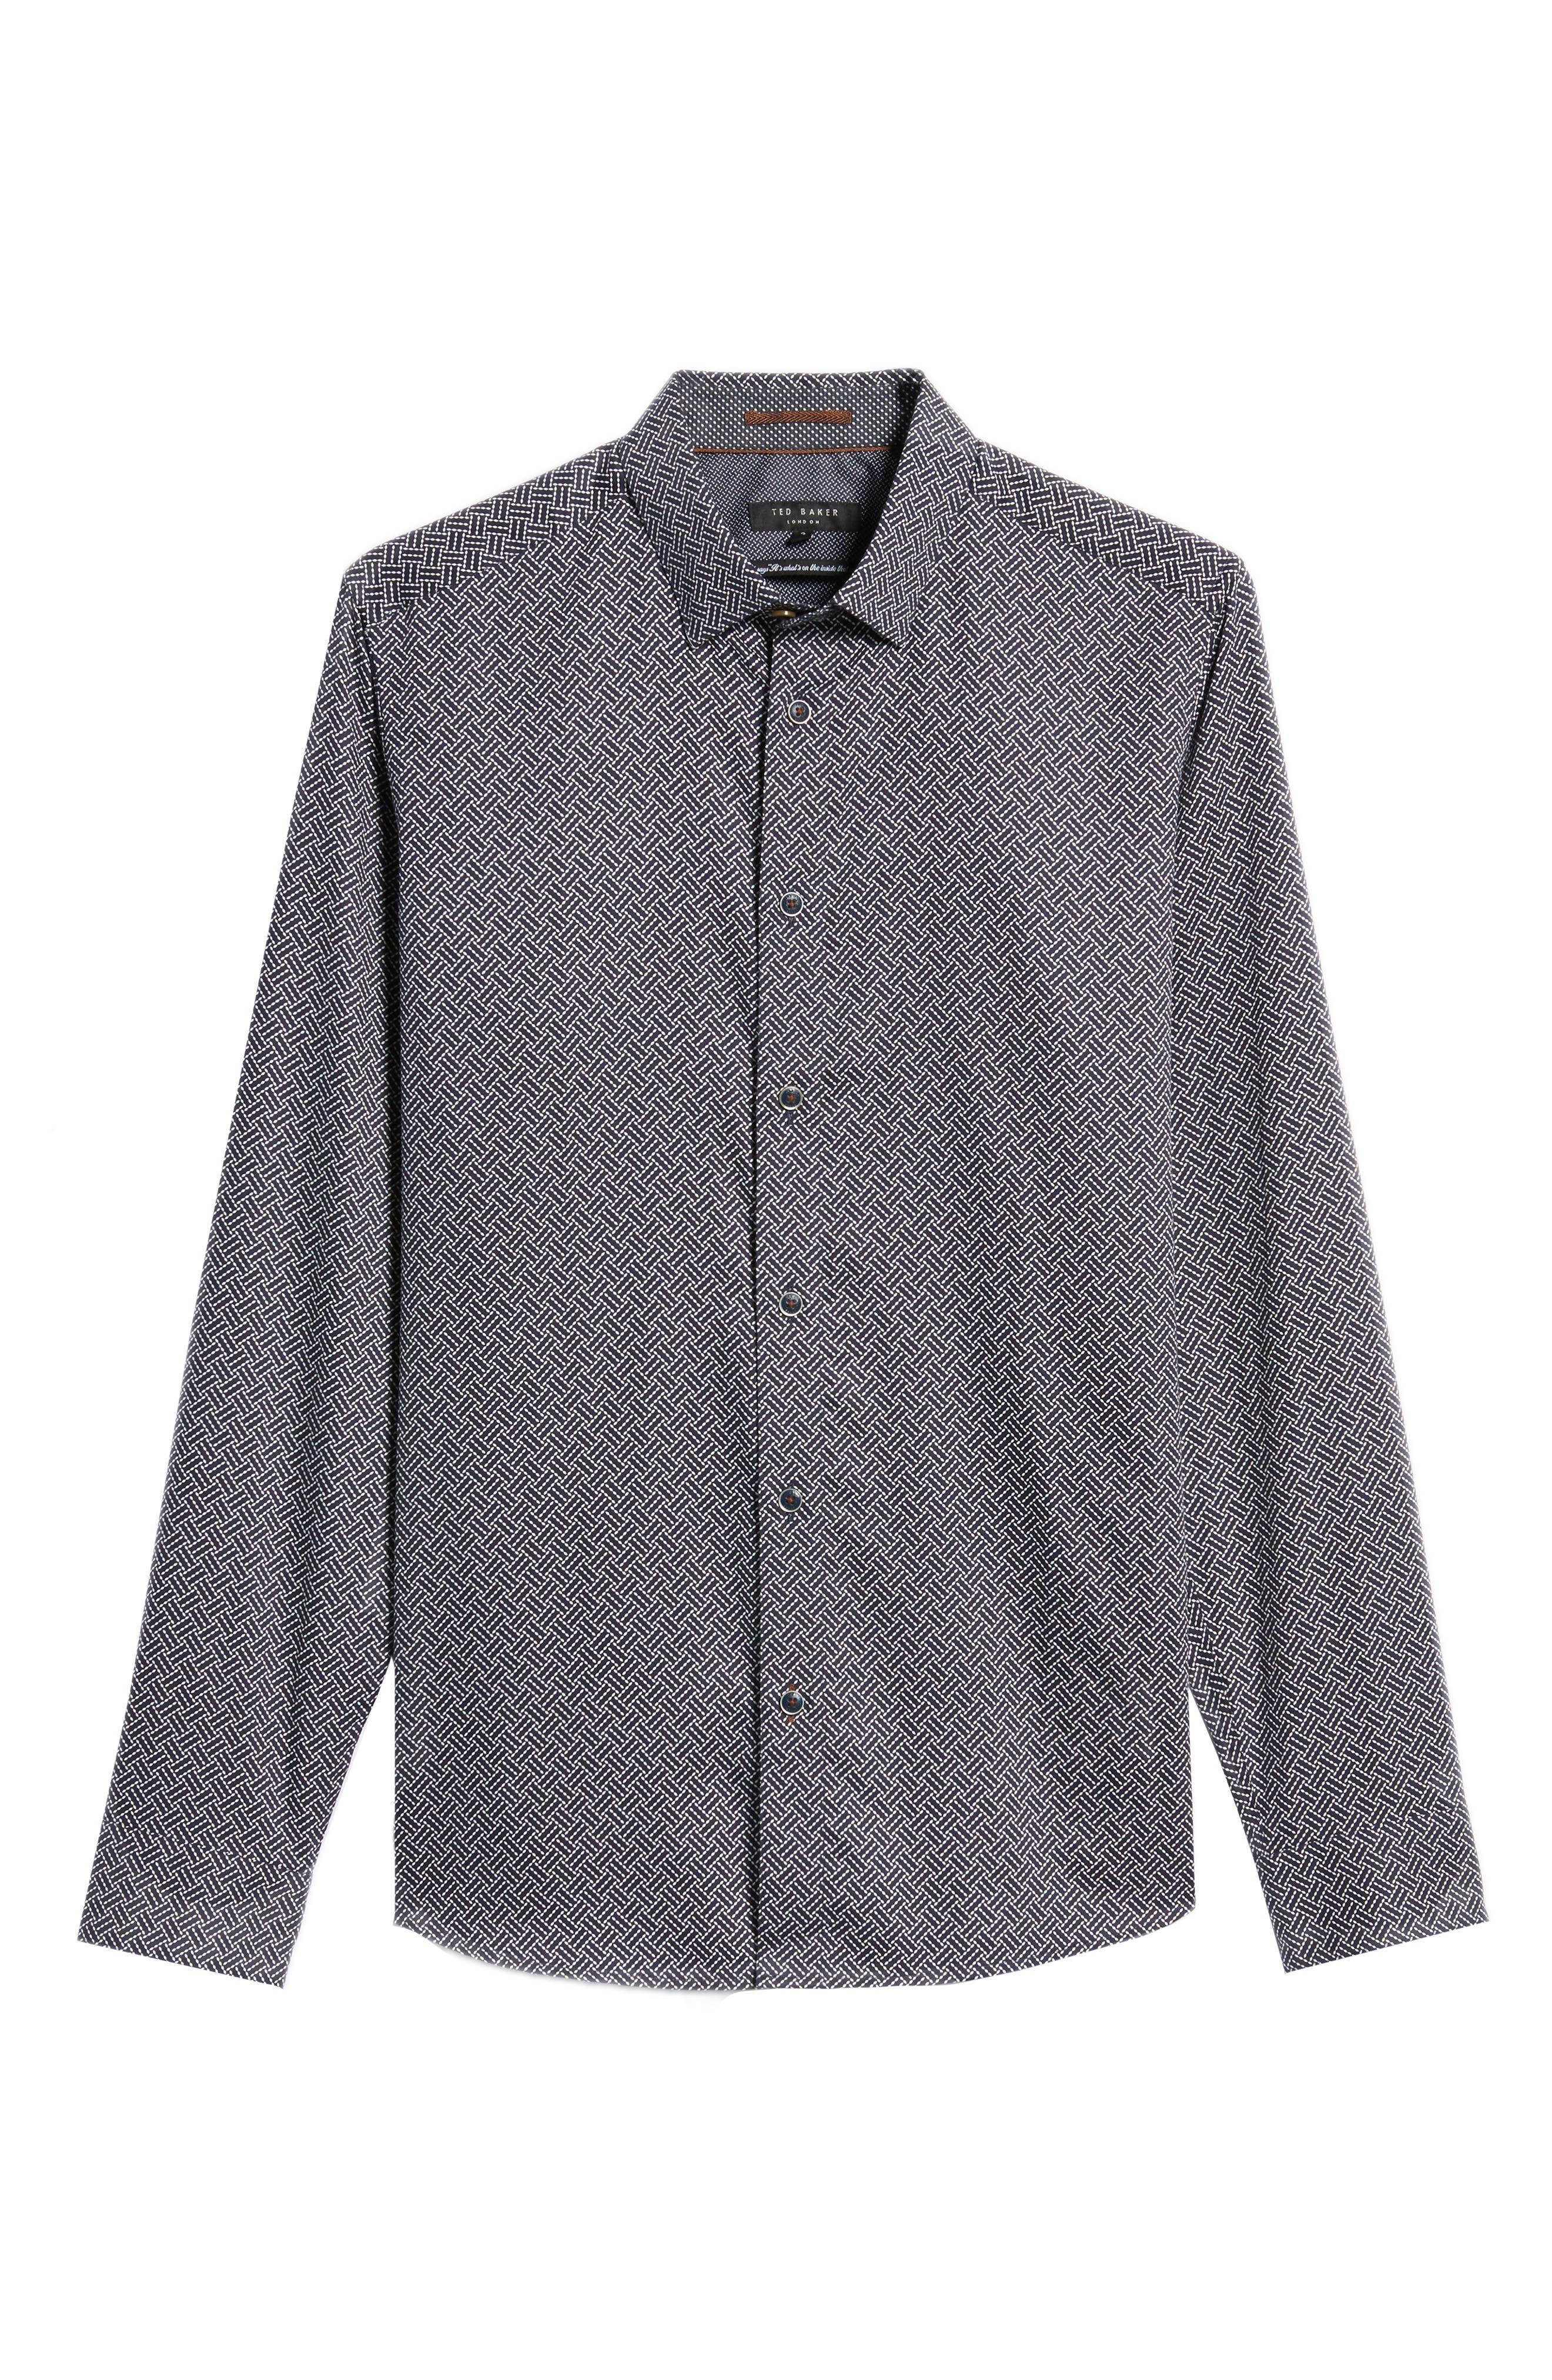 Larosh Slim Fit Basket Weave Print Sport Shirt,                             Alternate thumbnail 6, color,                             Navy